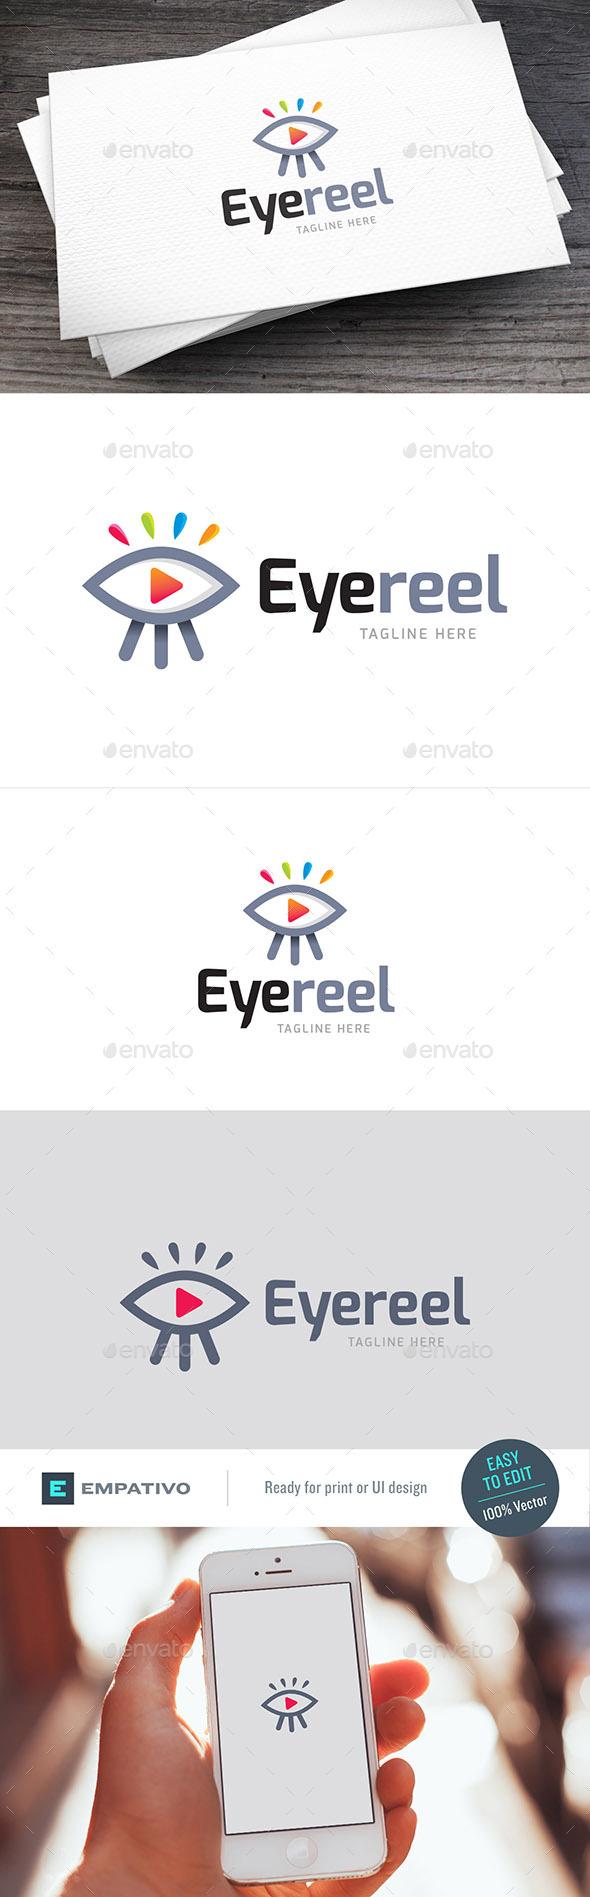 Eyefilms Logo Template